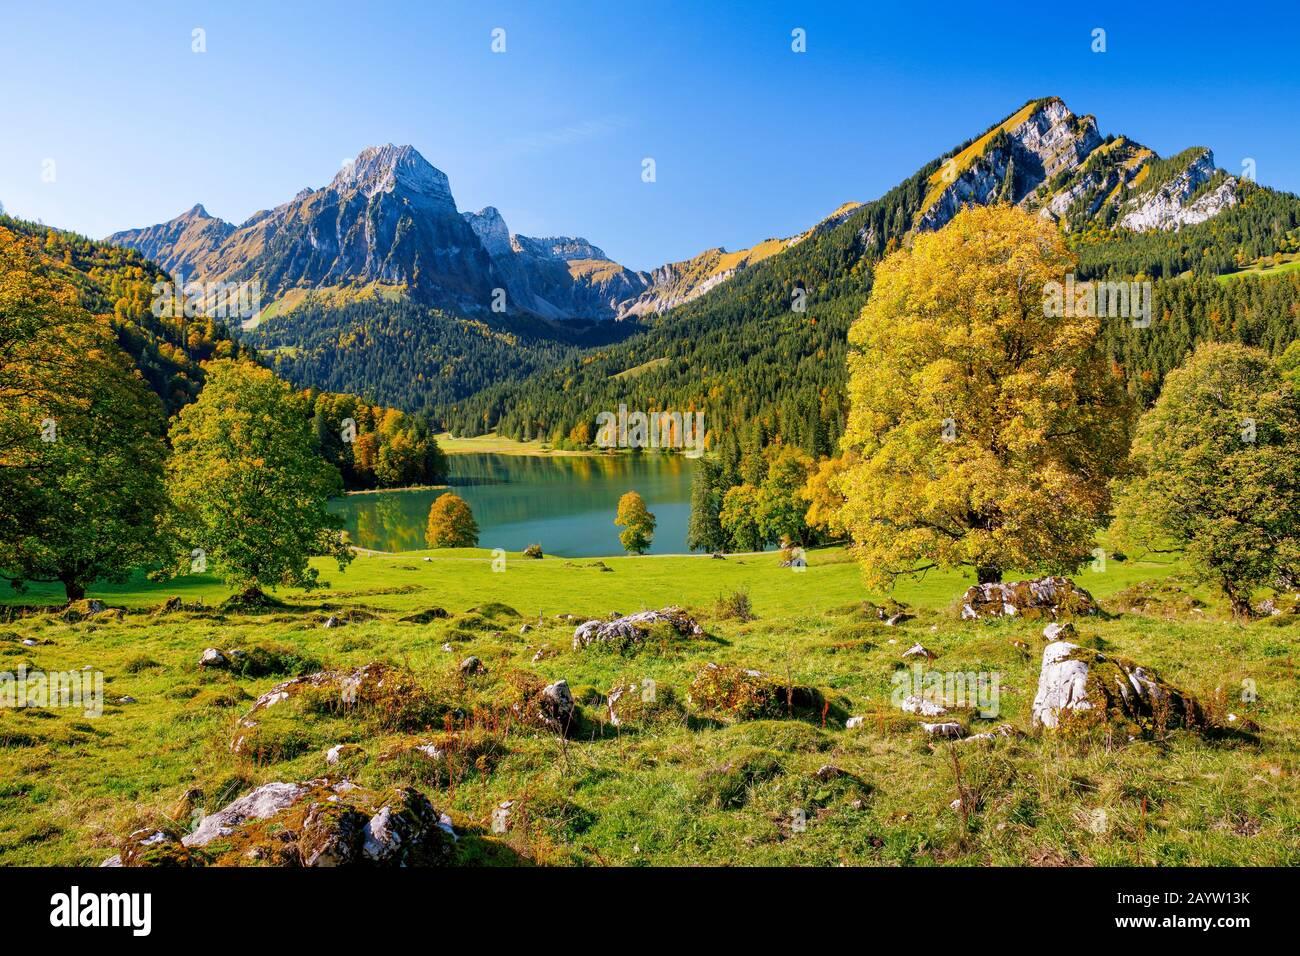 sycamore maple, great maple (Acer pseudoplatanus), lake Obersee and Bruennelistock in autumn, Switzerland, Glarner Alpen, Glarus Stock Photo